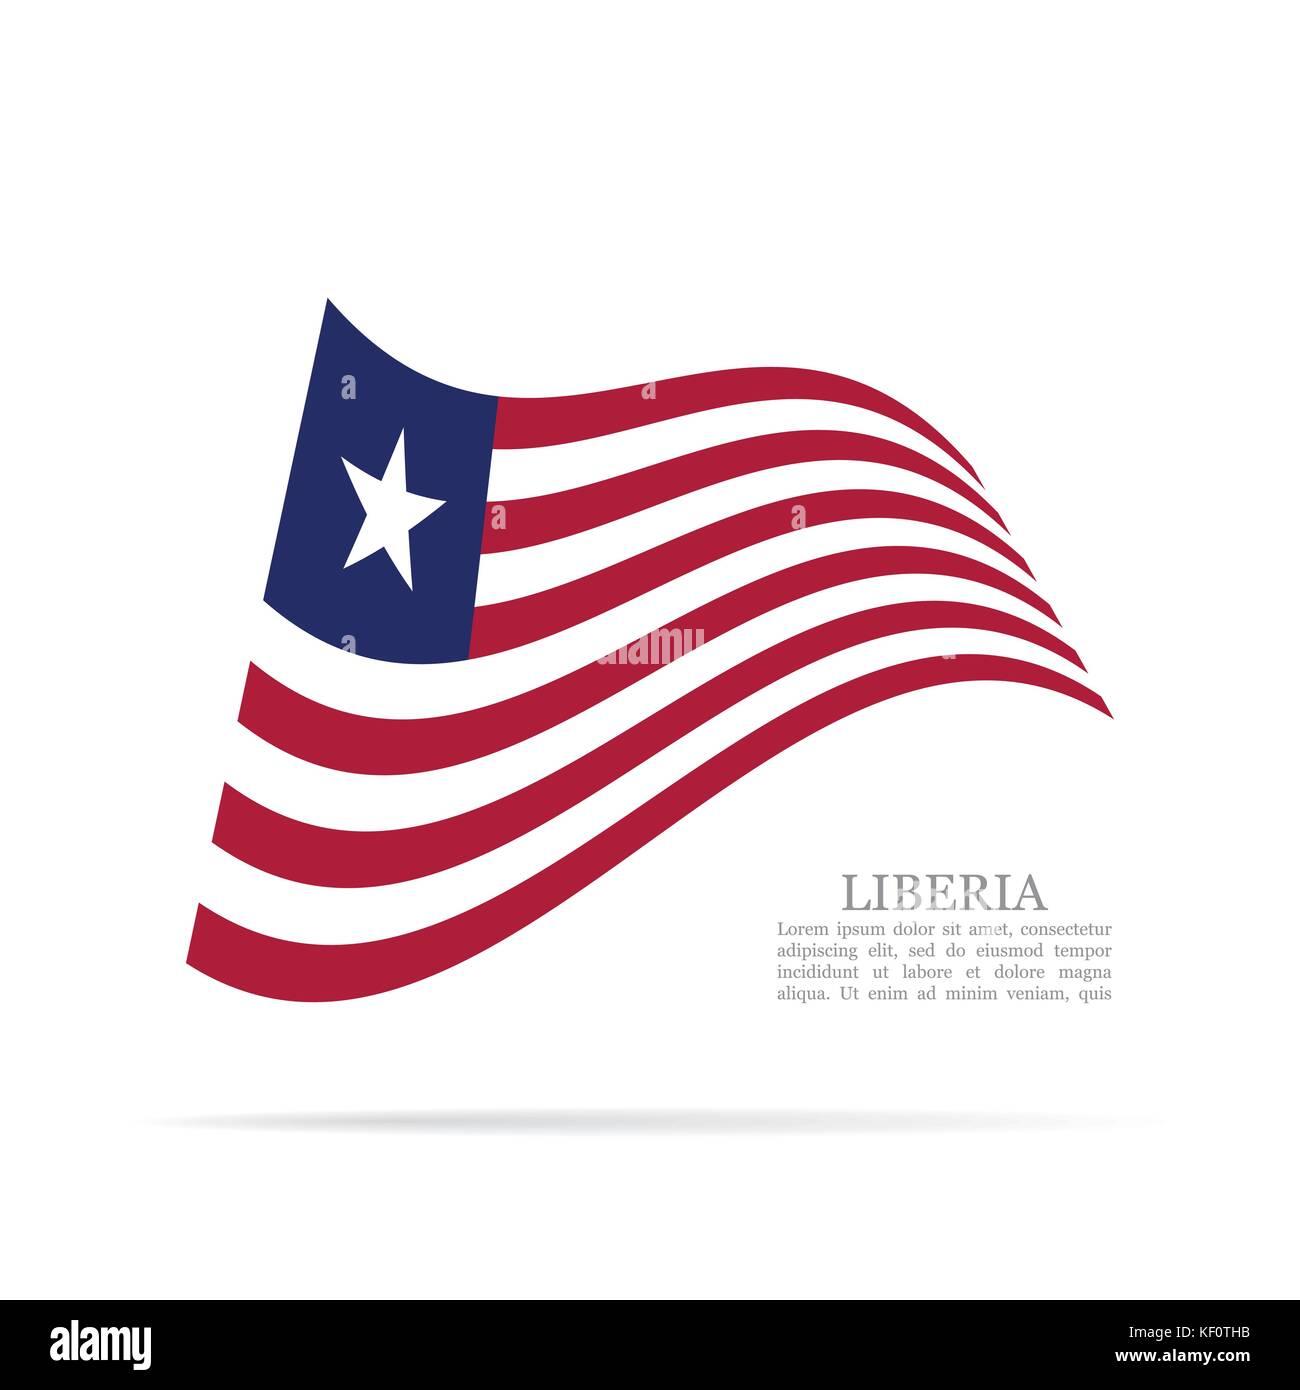 Liberia national flag waving vector icon - Stock Image